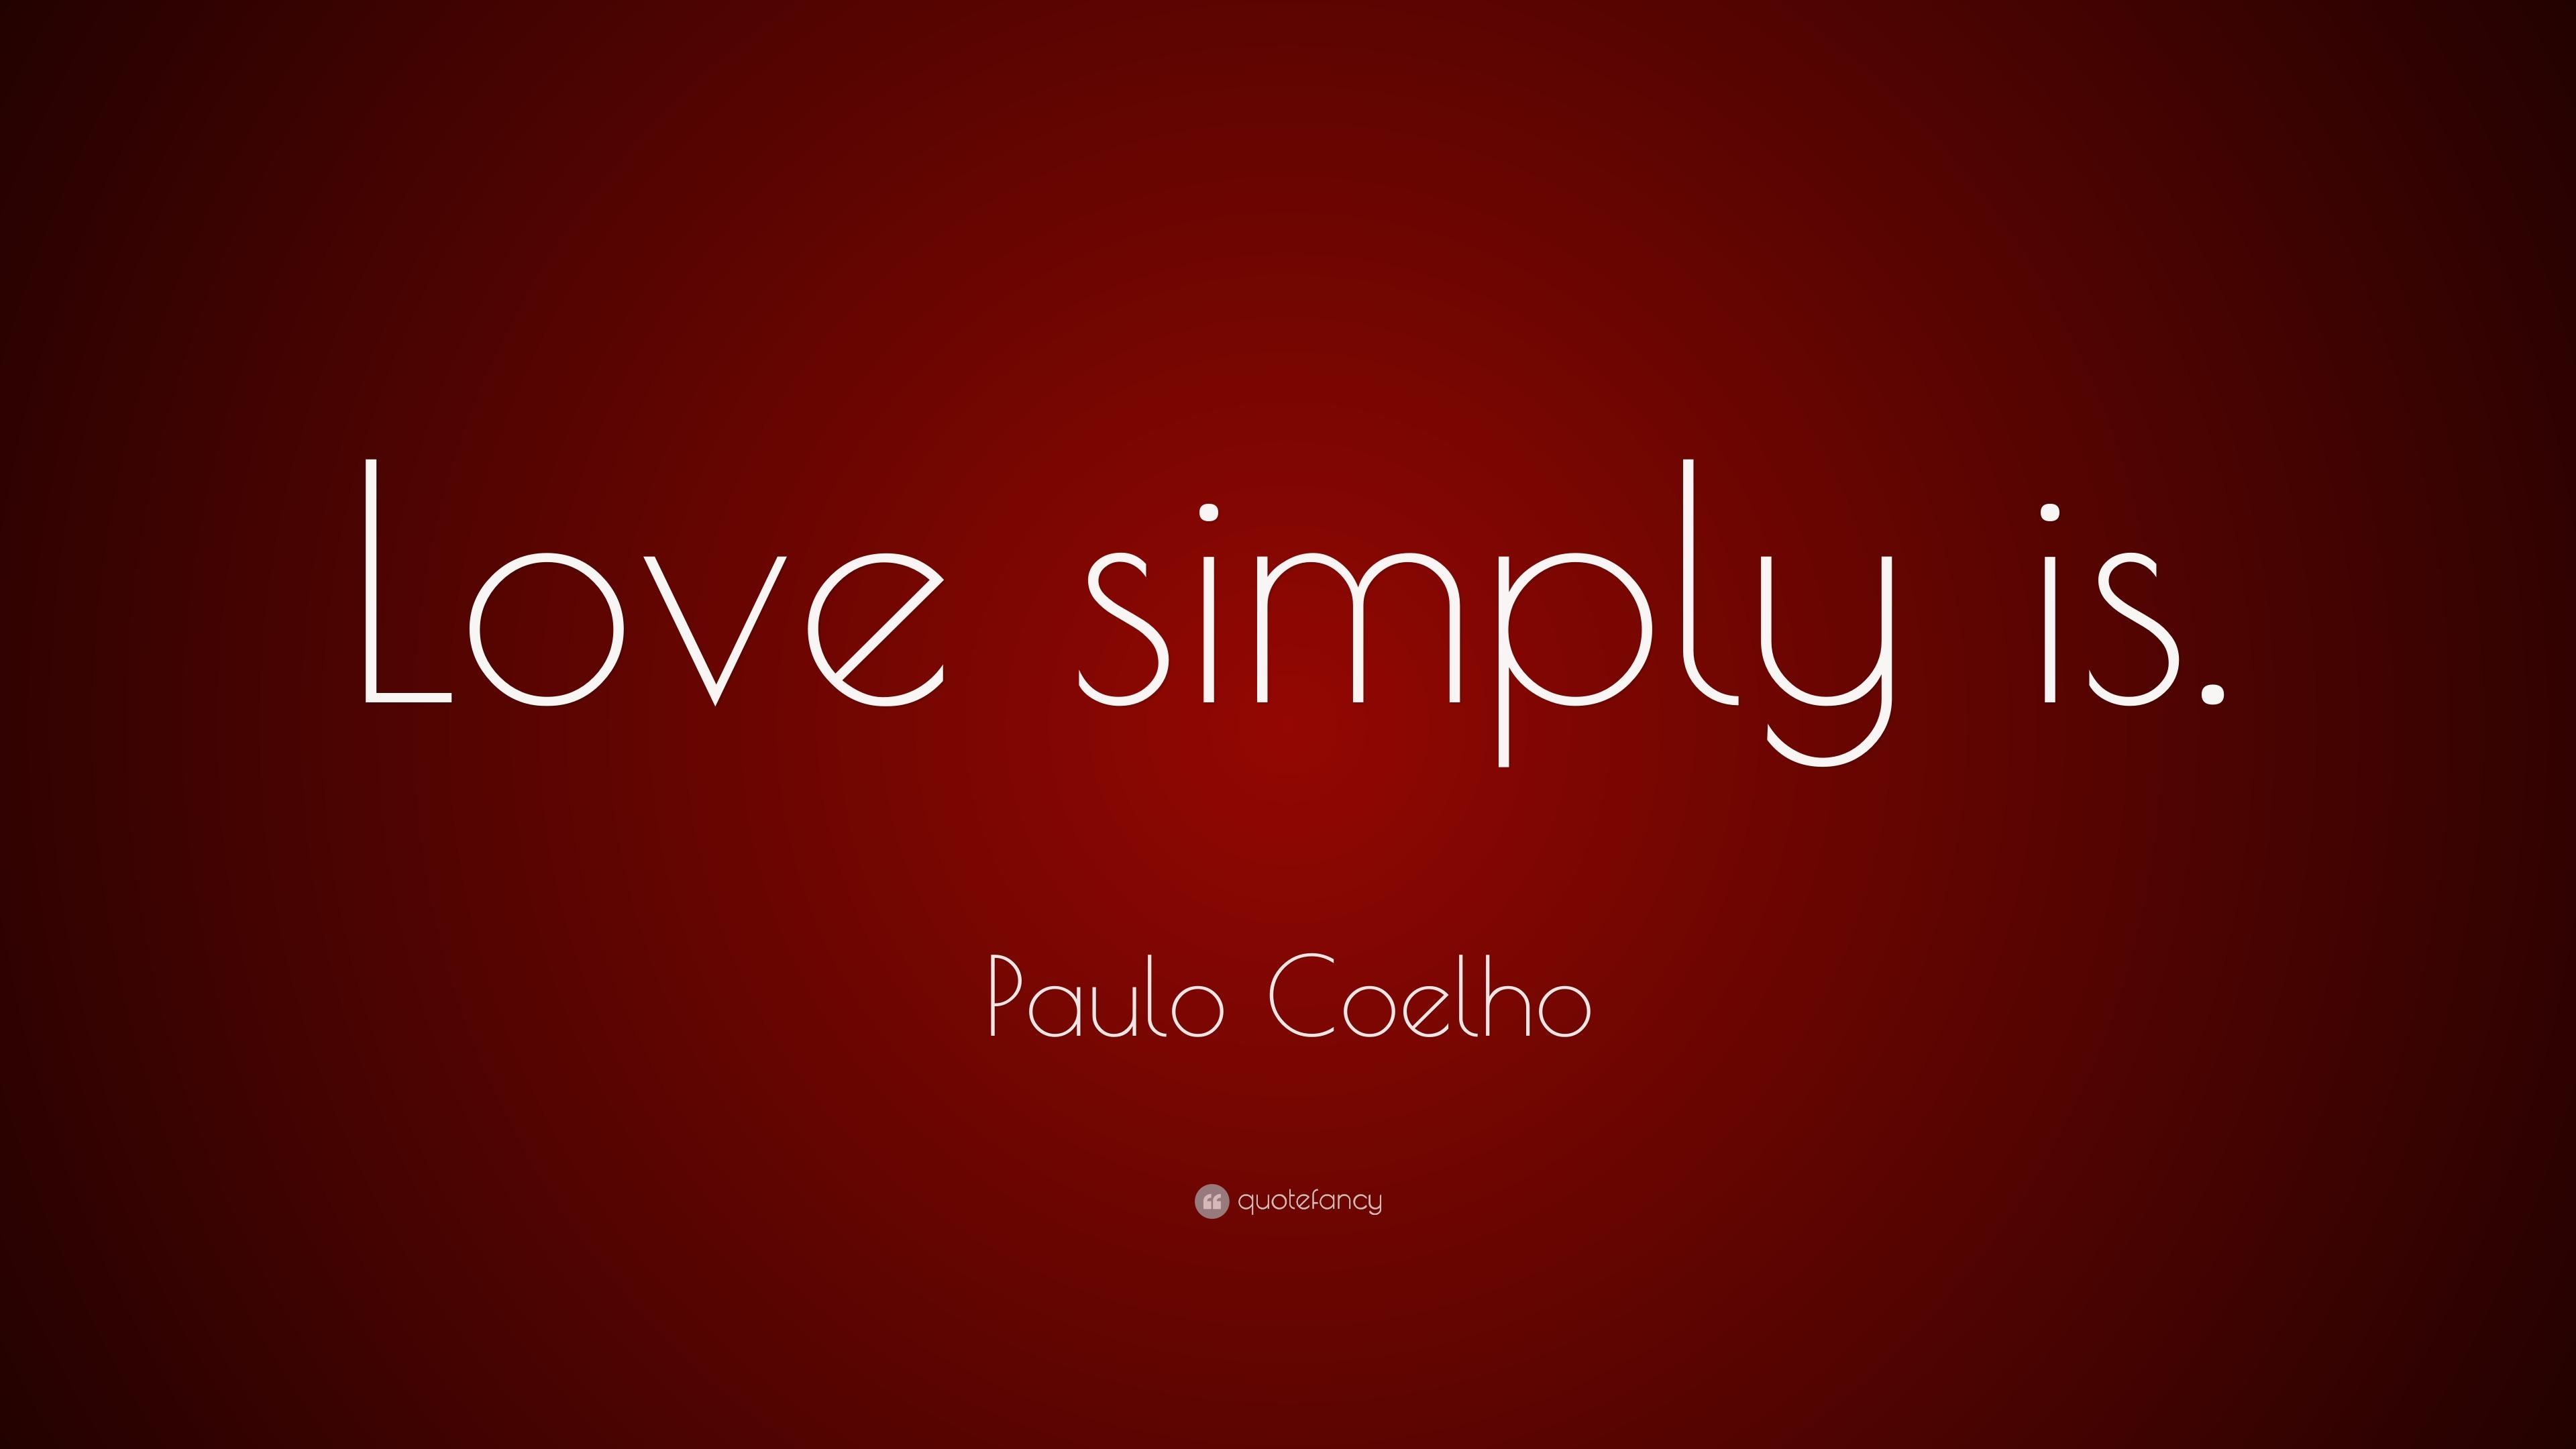 Paulo Coelho Quotes 28 Wallpapers Quotefancy